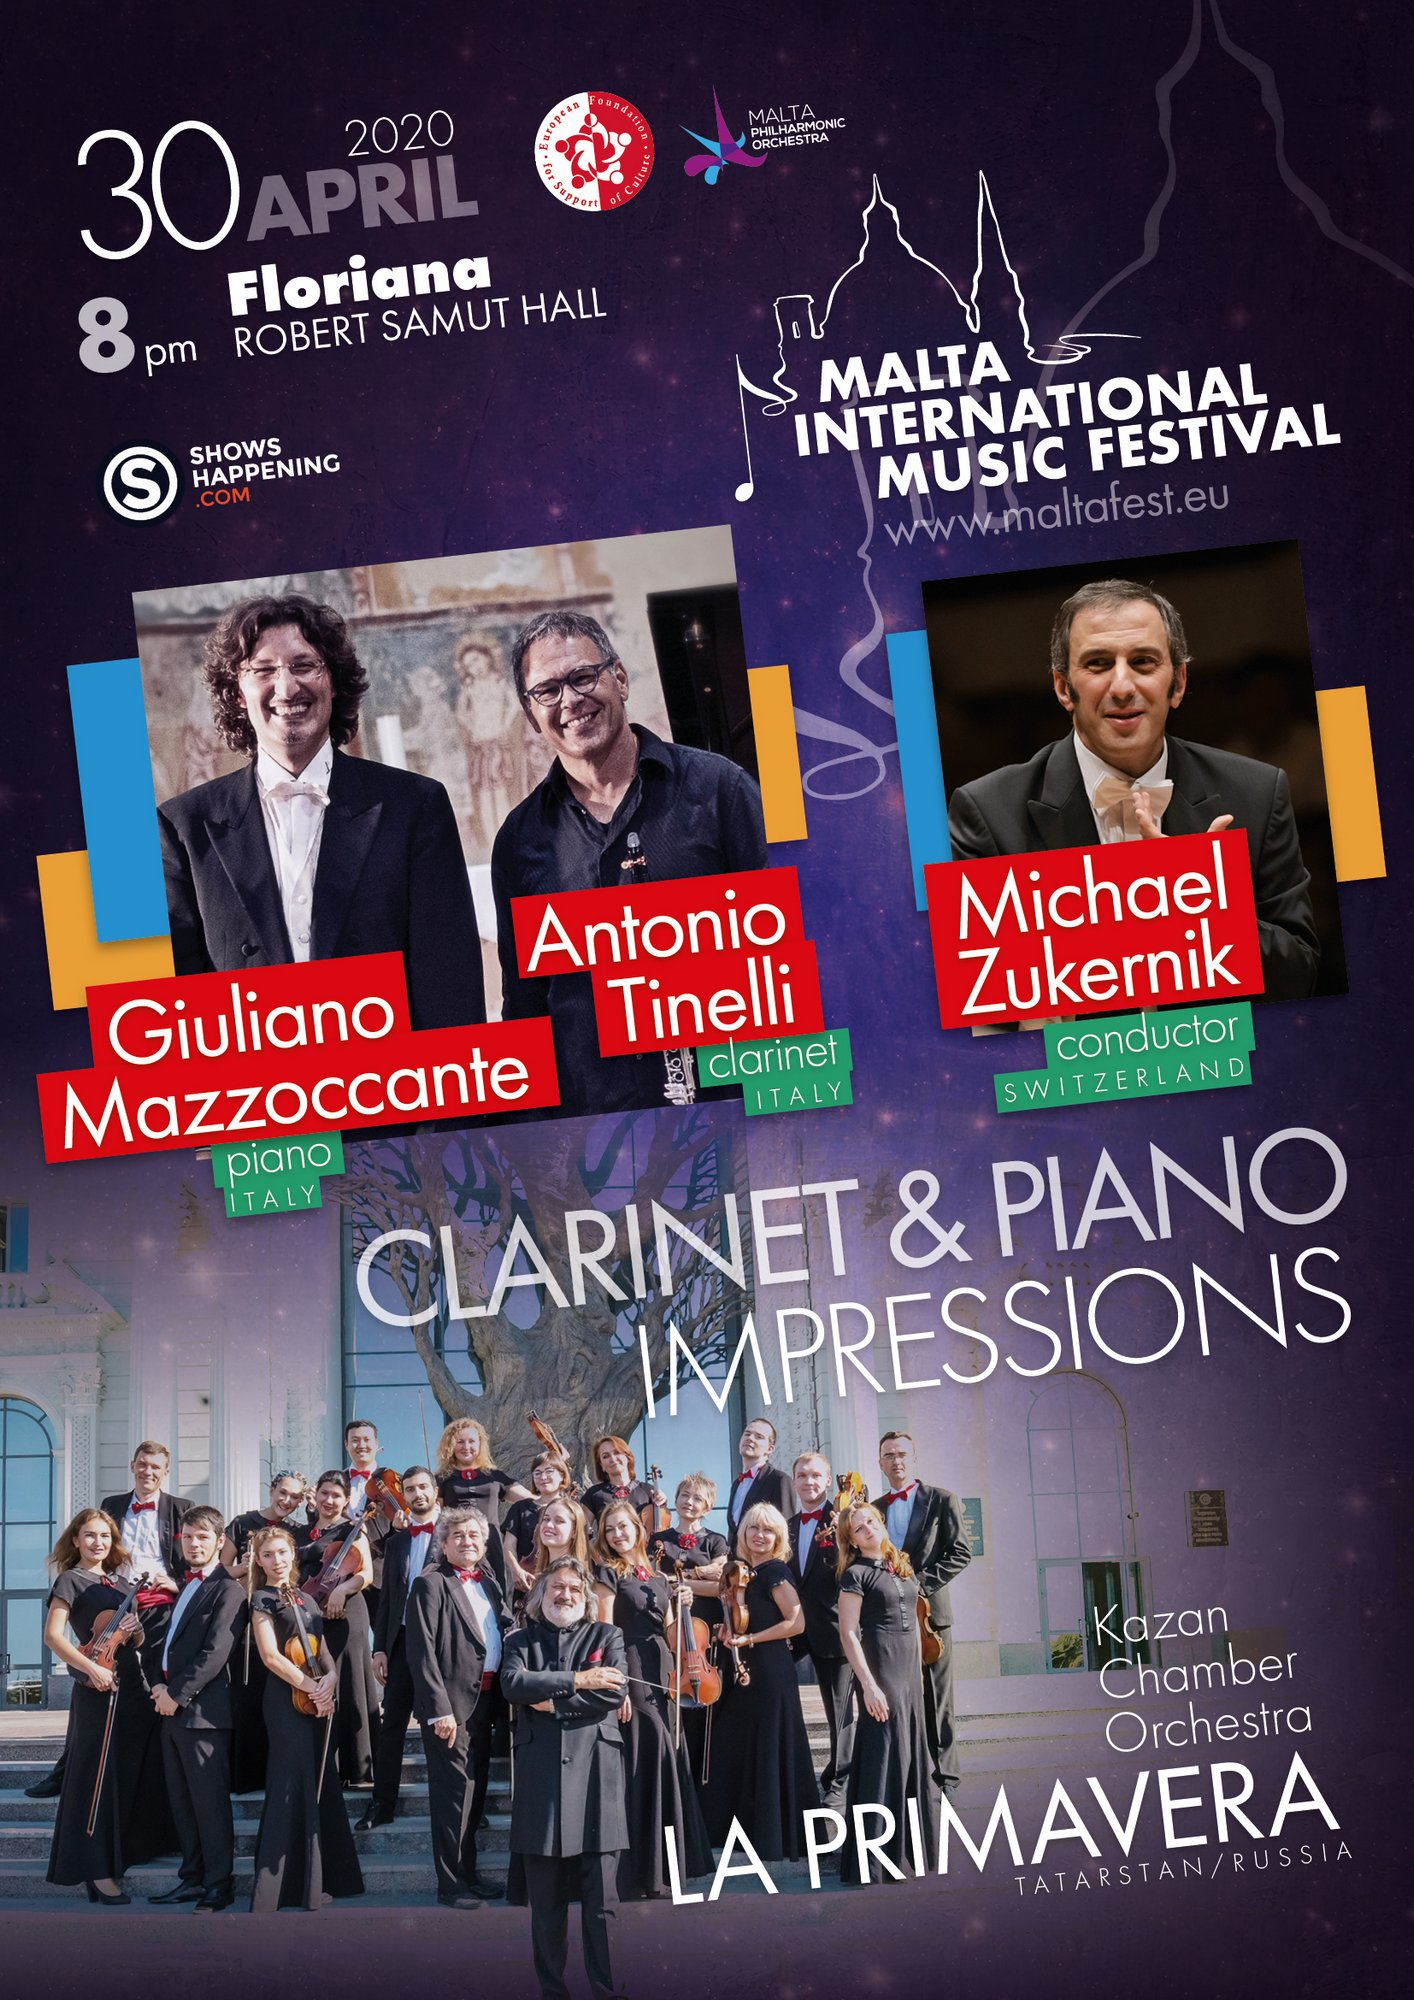 CLARINET & PIANO IMPRESSIONS flyer